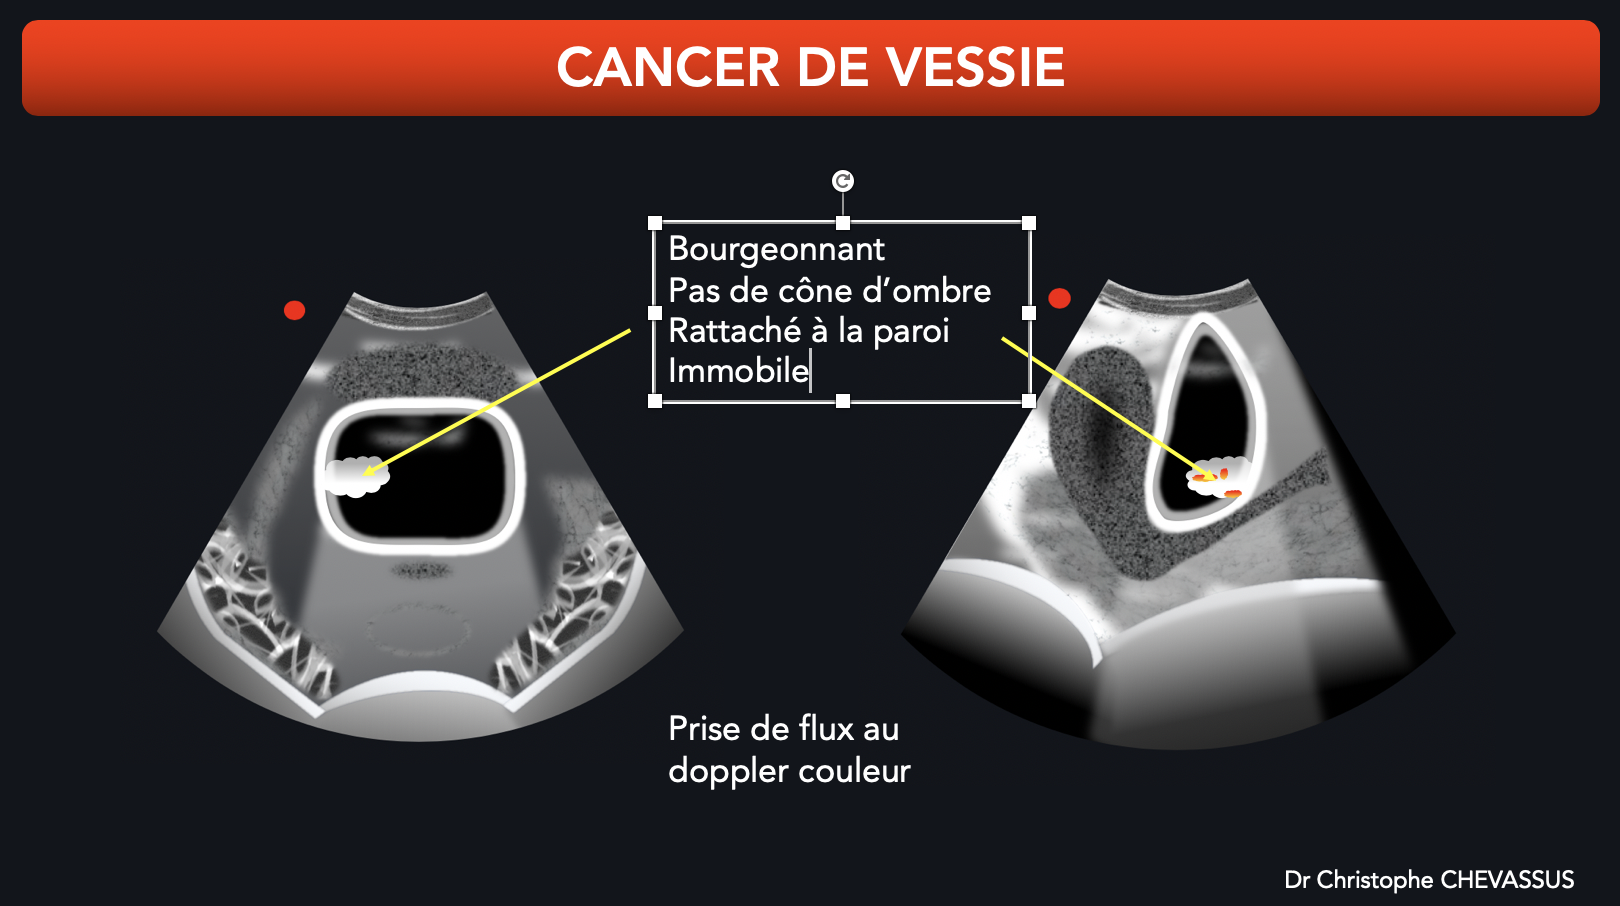 Cancer de vessie